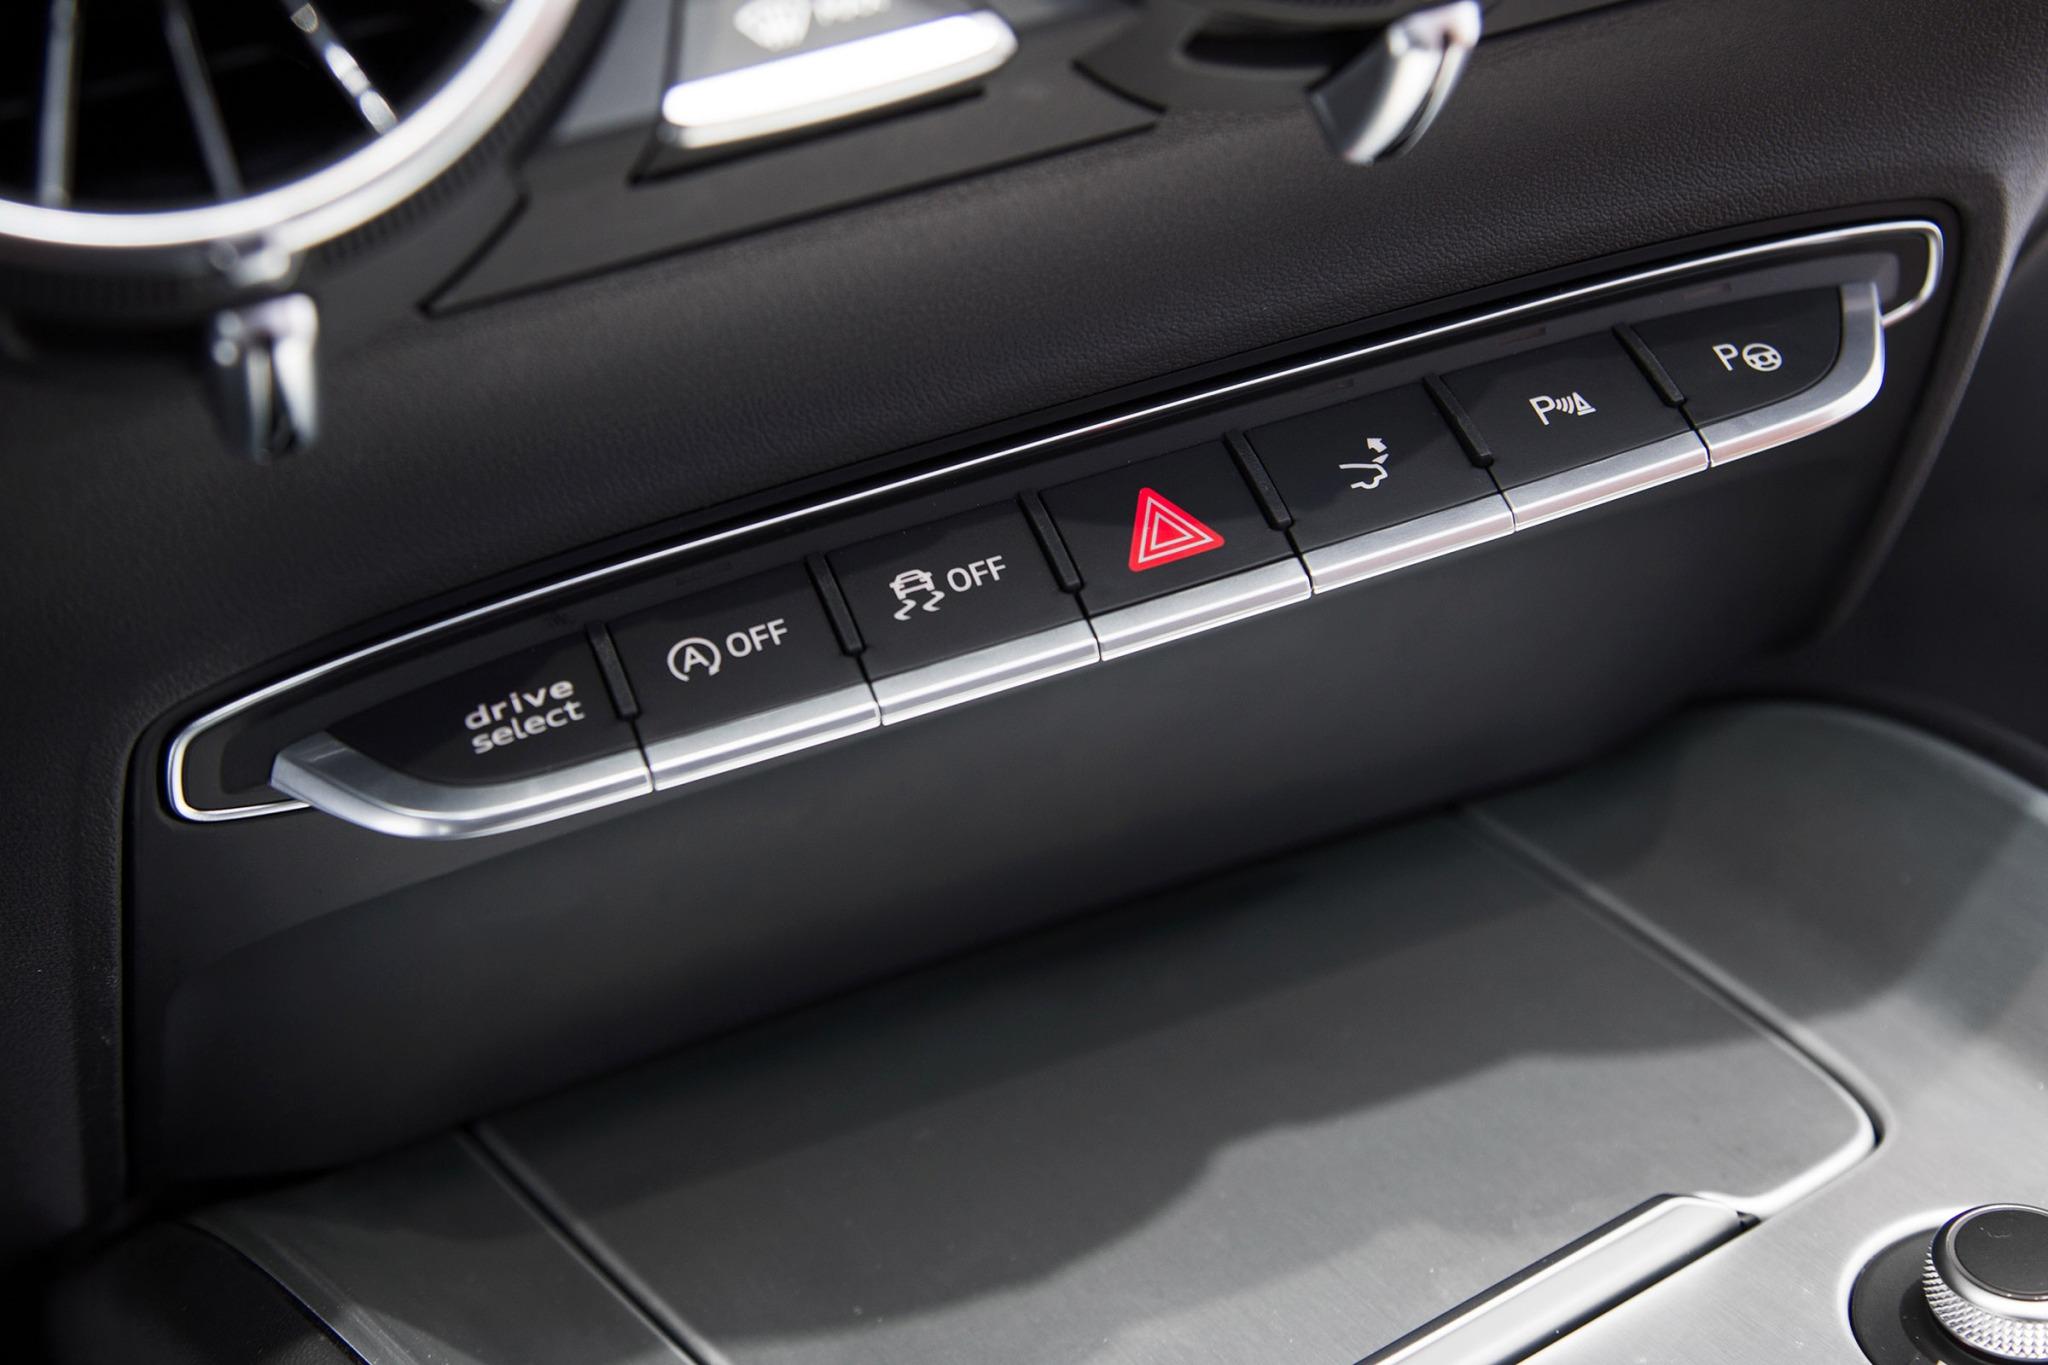 2016 Audi Tt Image 9